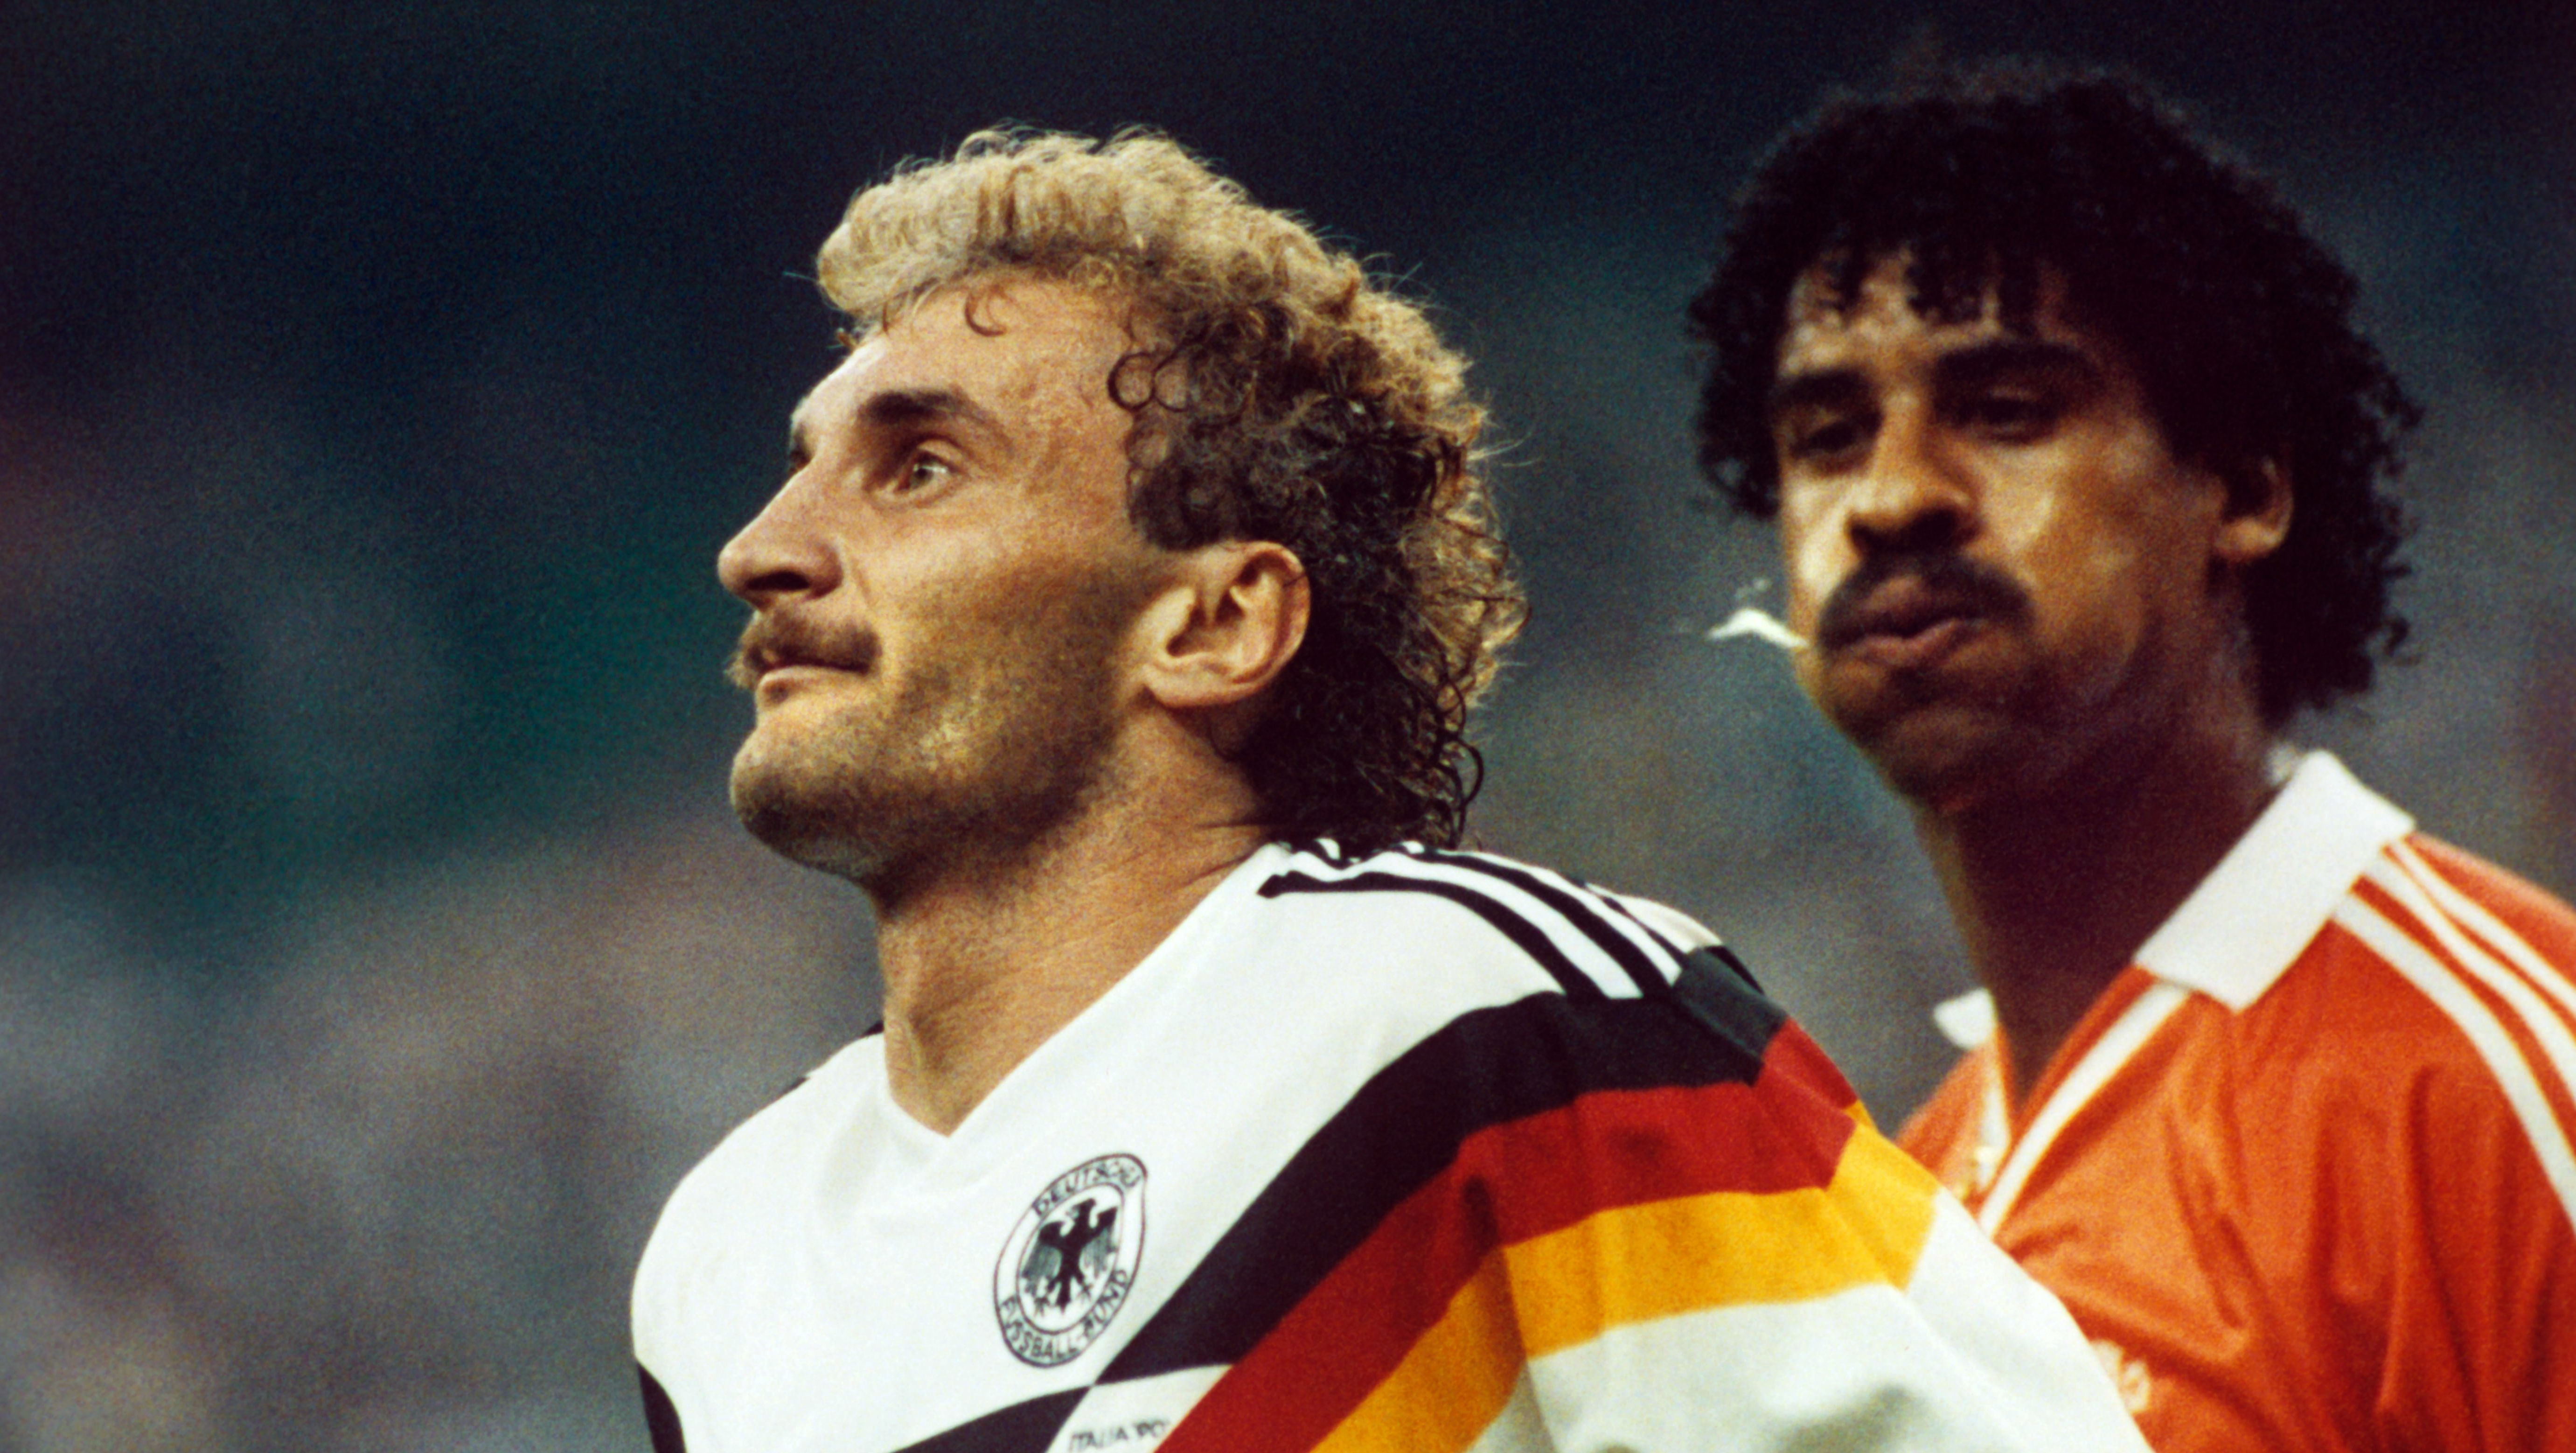 Rudi Völler und Frank Rijkaard im WM-Achtelfinale 1990